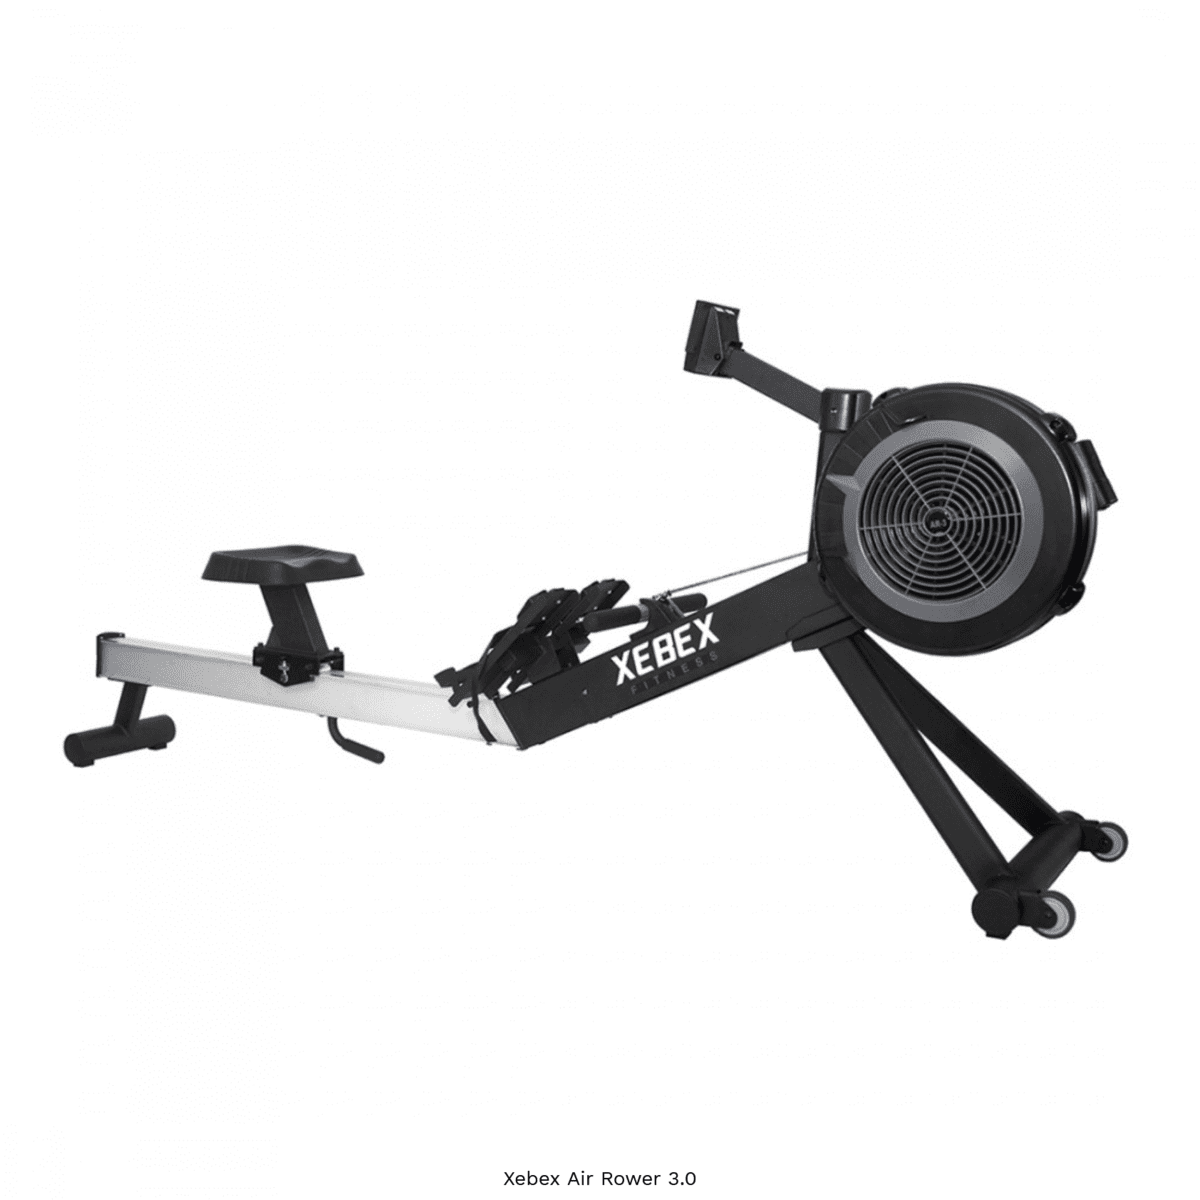 Xebex Air Rower 3.0